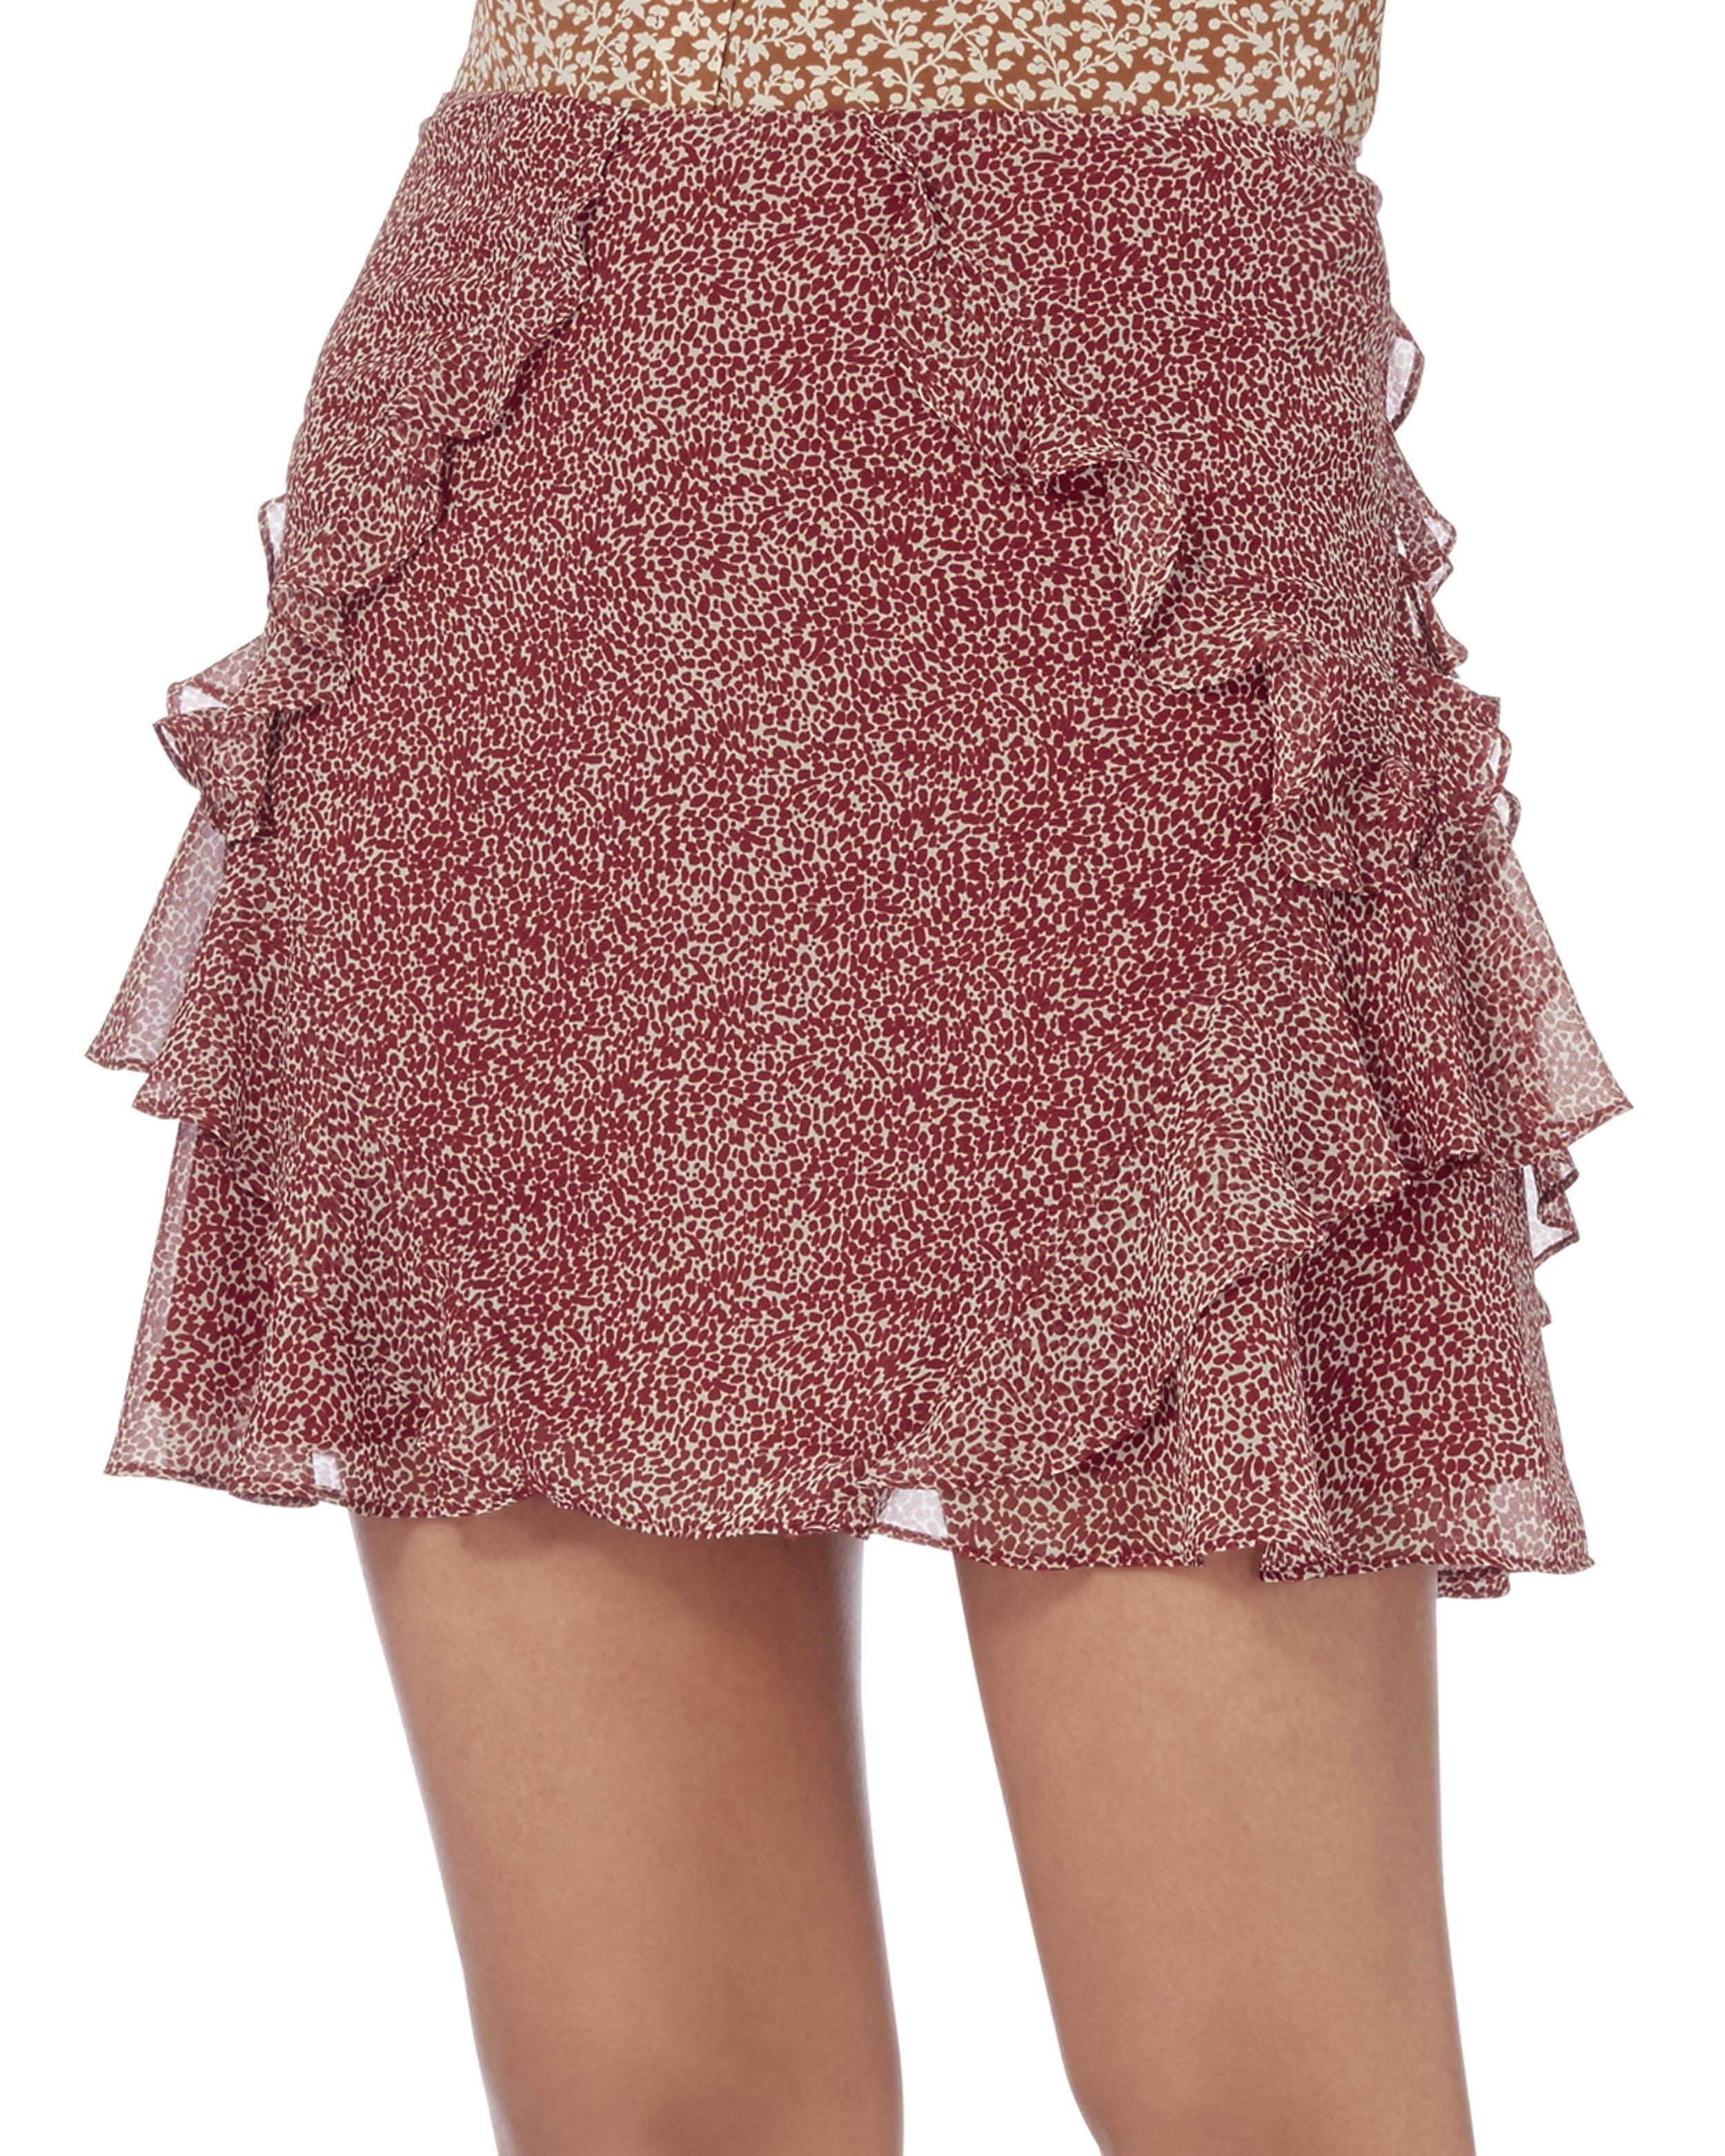 588a661719 10 Crosby Derek Lam Red Dot Ruffle Mini Skirt in Red - Lyst